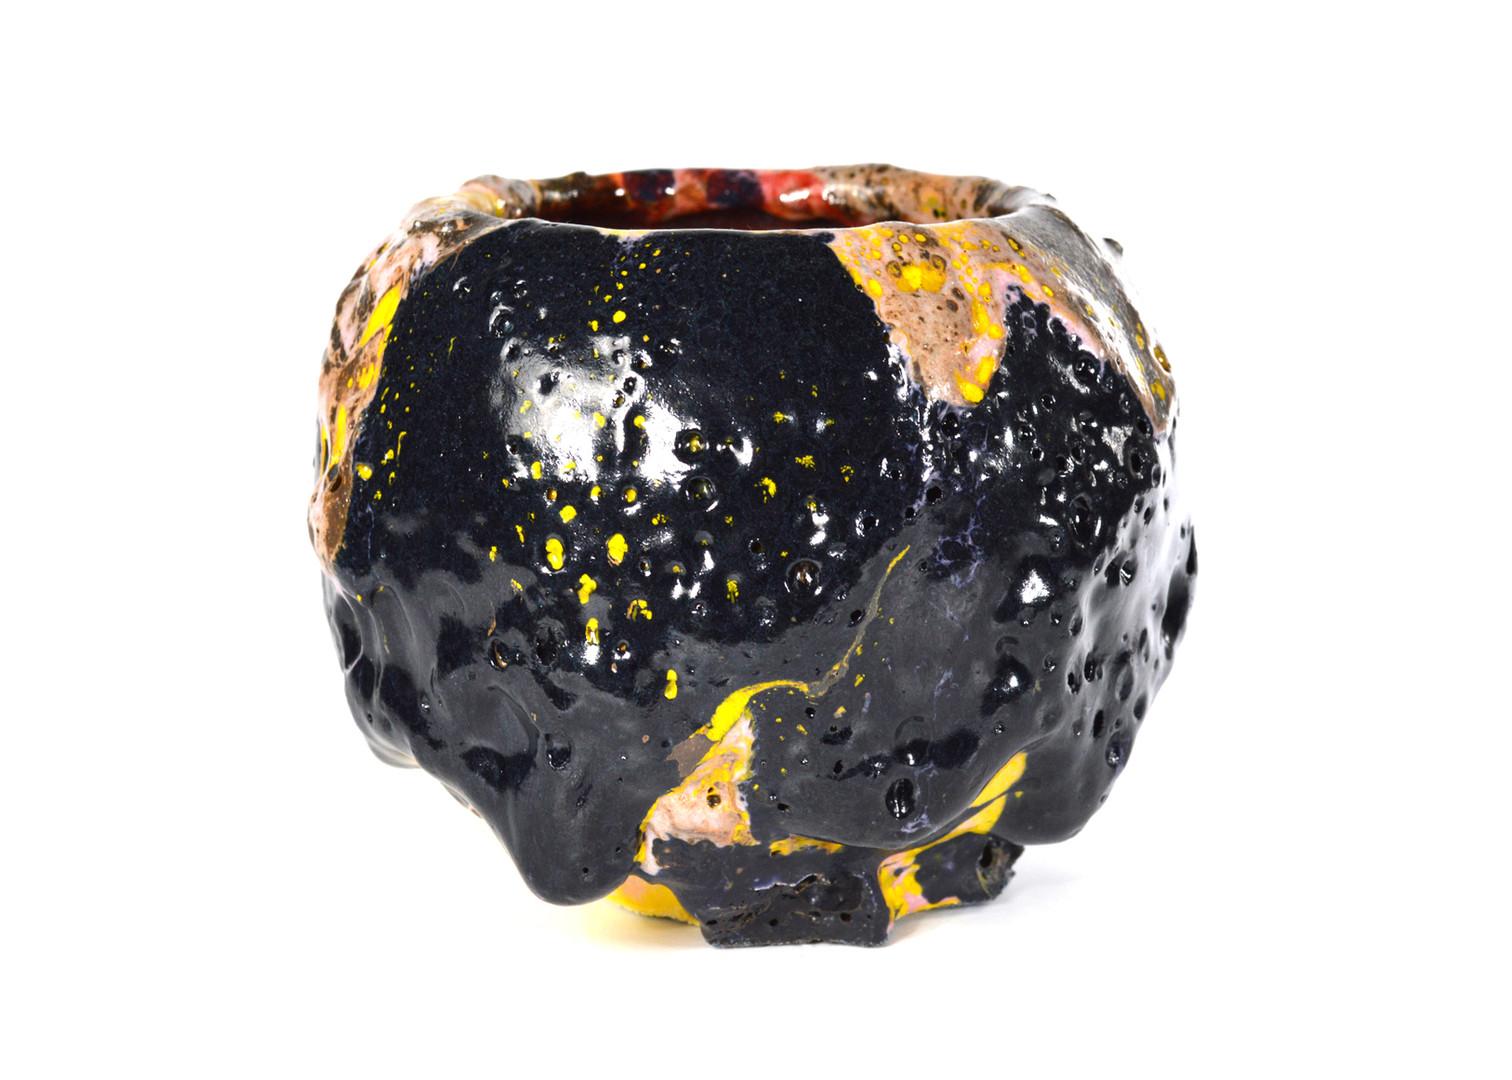 Pam-Space-Dog-Moon-Jar-Yellow-Red-1.jpg